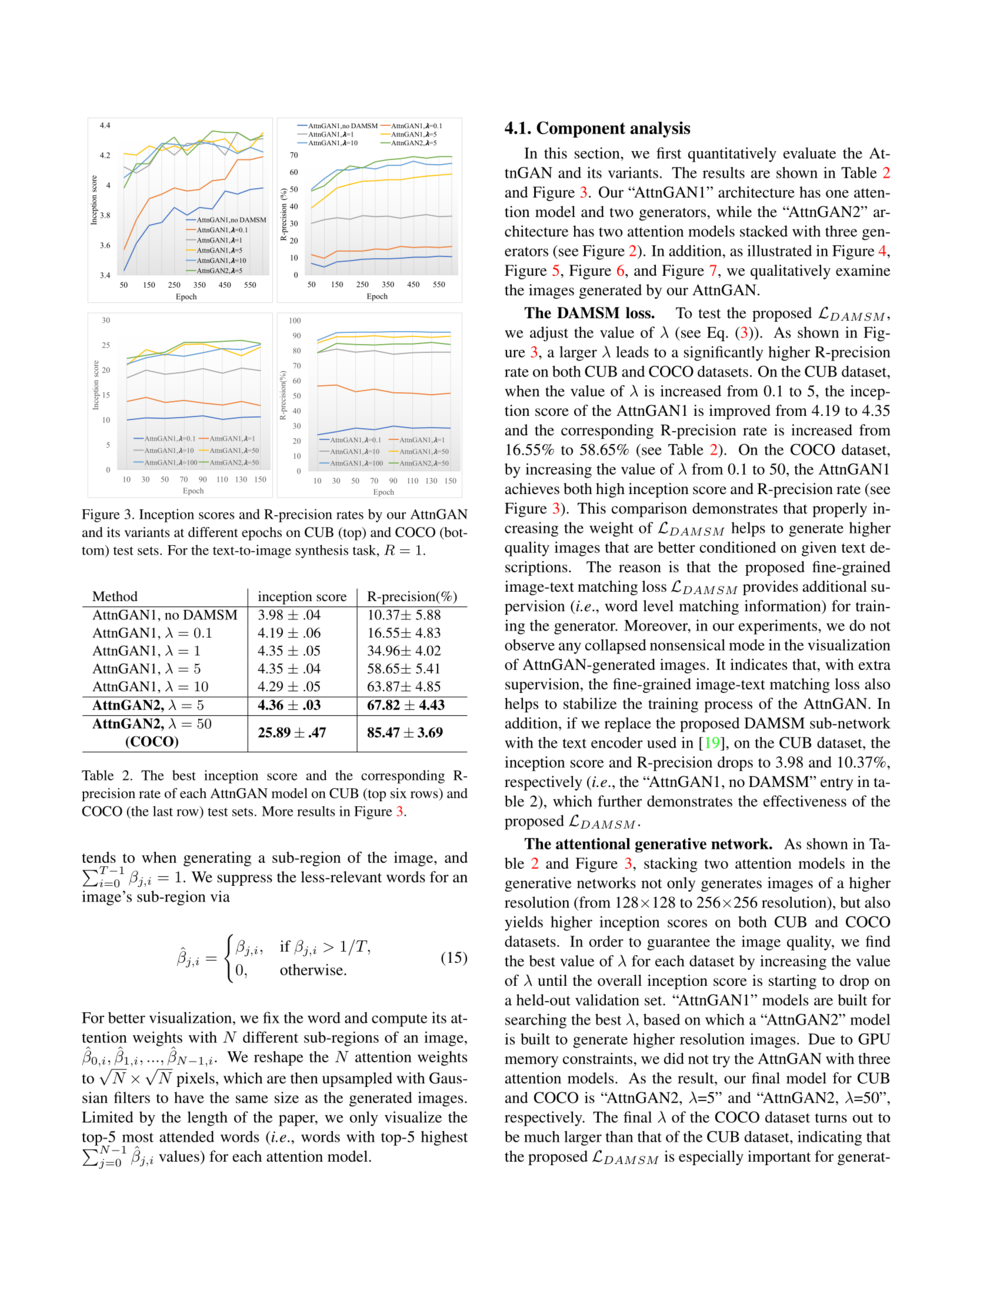 microsoft-researchers-build-a-bot-that-draws.001-6.png